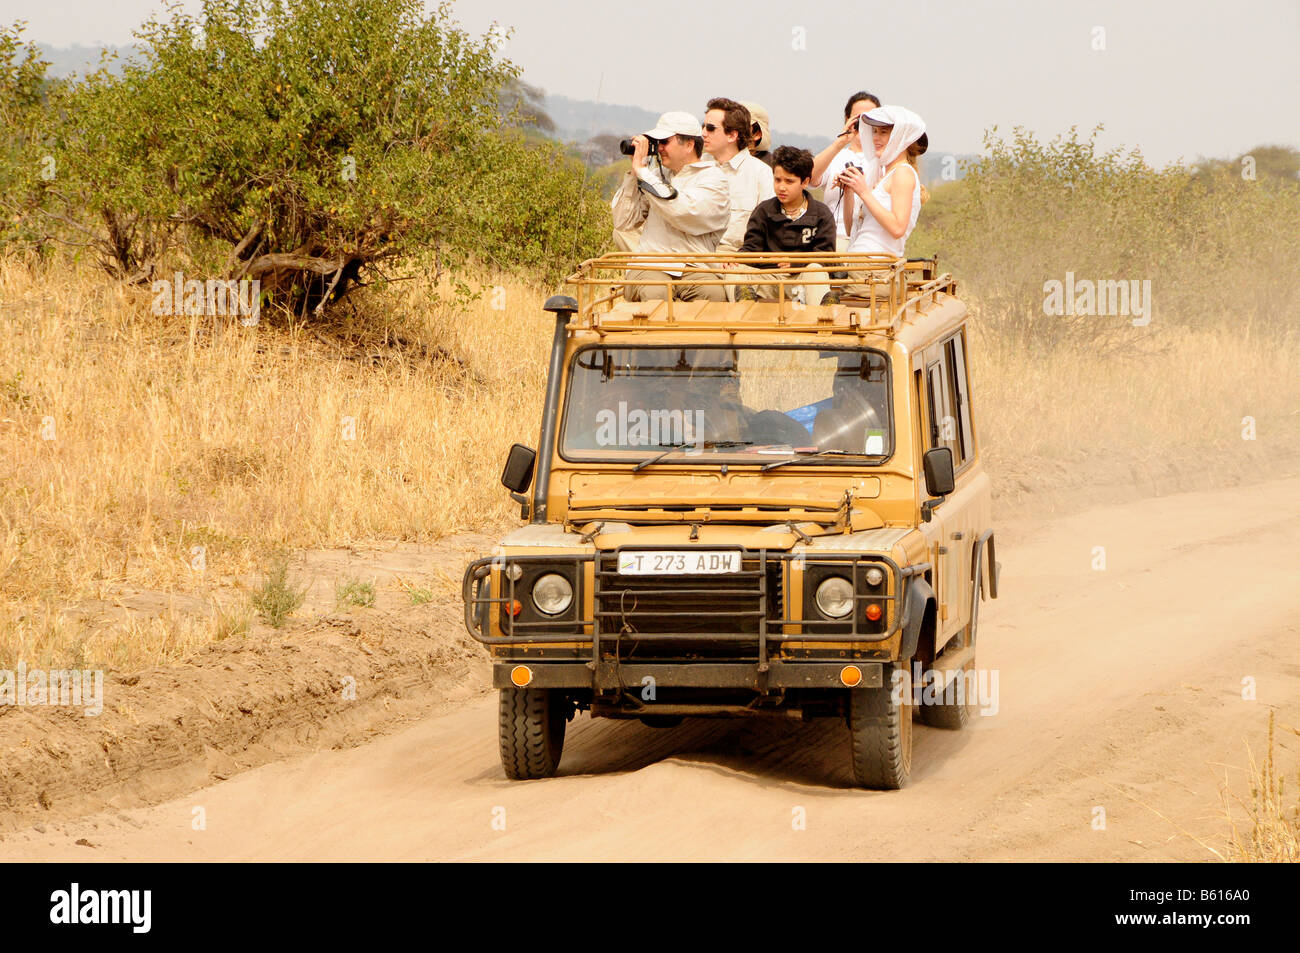 Tourists on safari in a four wheel drive vehicle, Tarangire-National Park, Tanzania, Africa - Stock Image